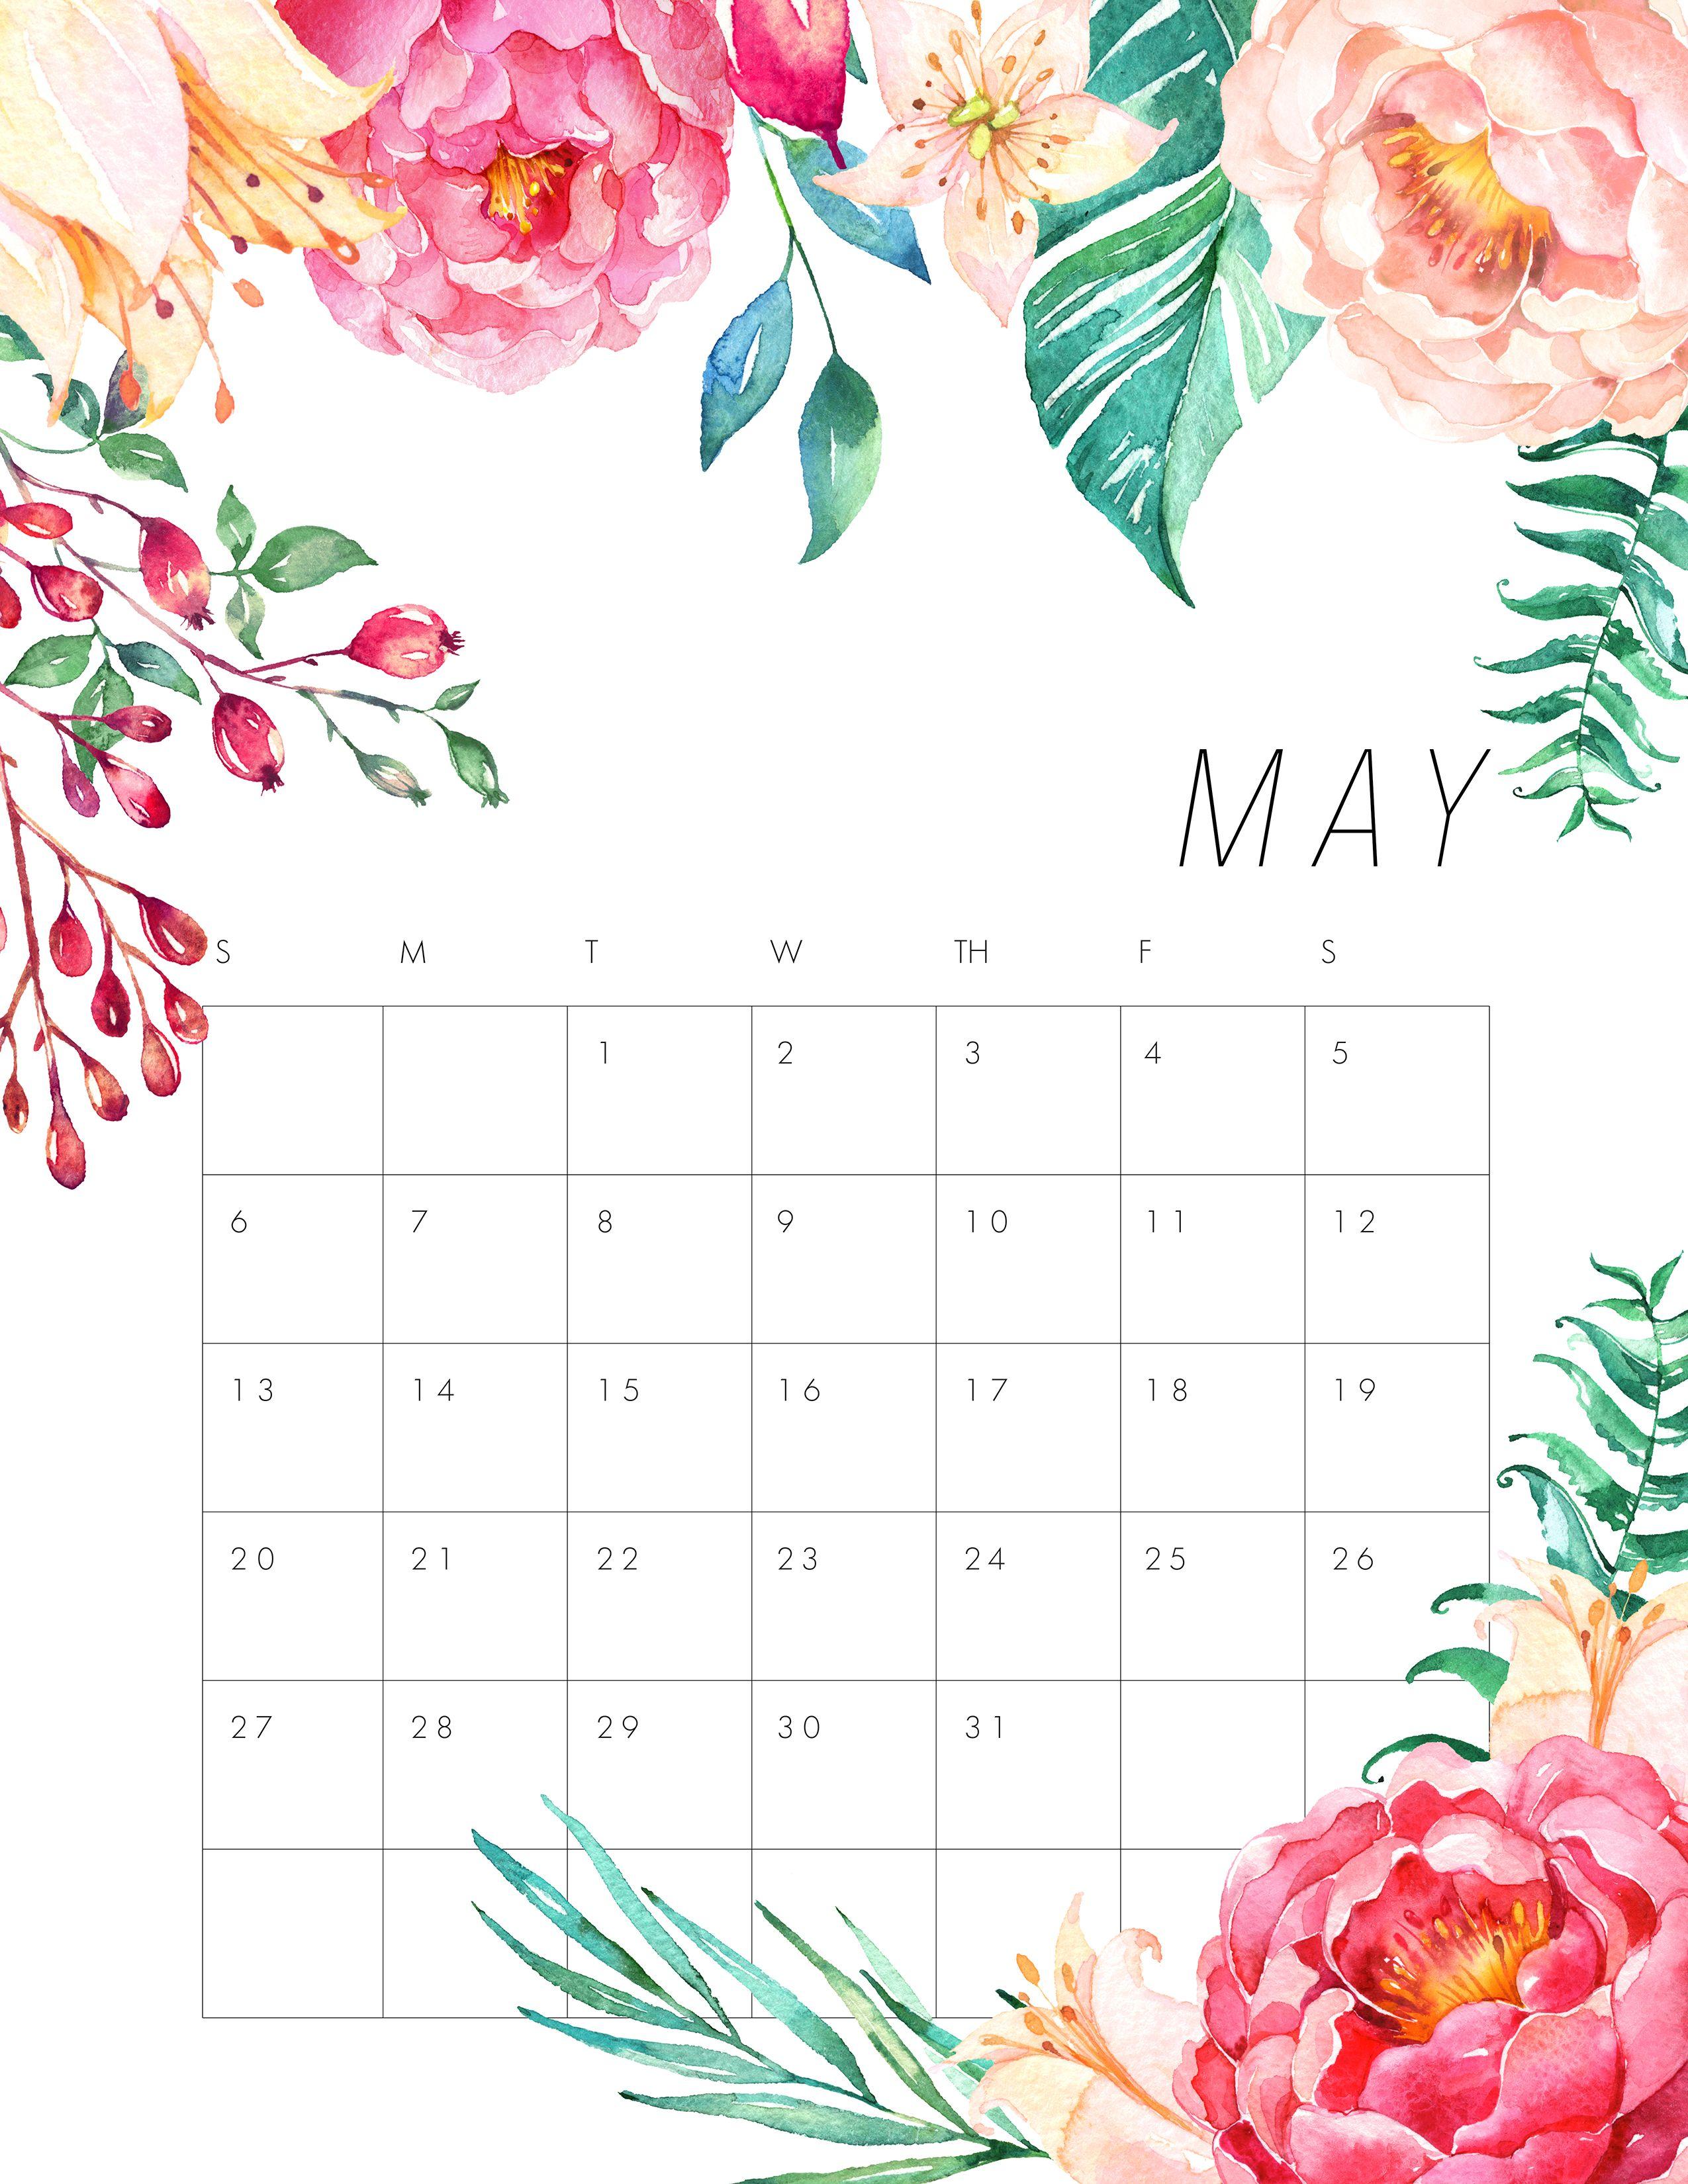 Free Printable 2018 Floral Calendar The Cottage Market Kalendar Dlya Pechati Pechatnye Kalendari Planirovshiki